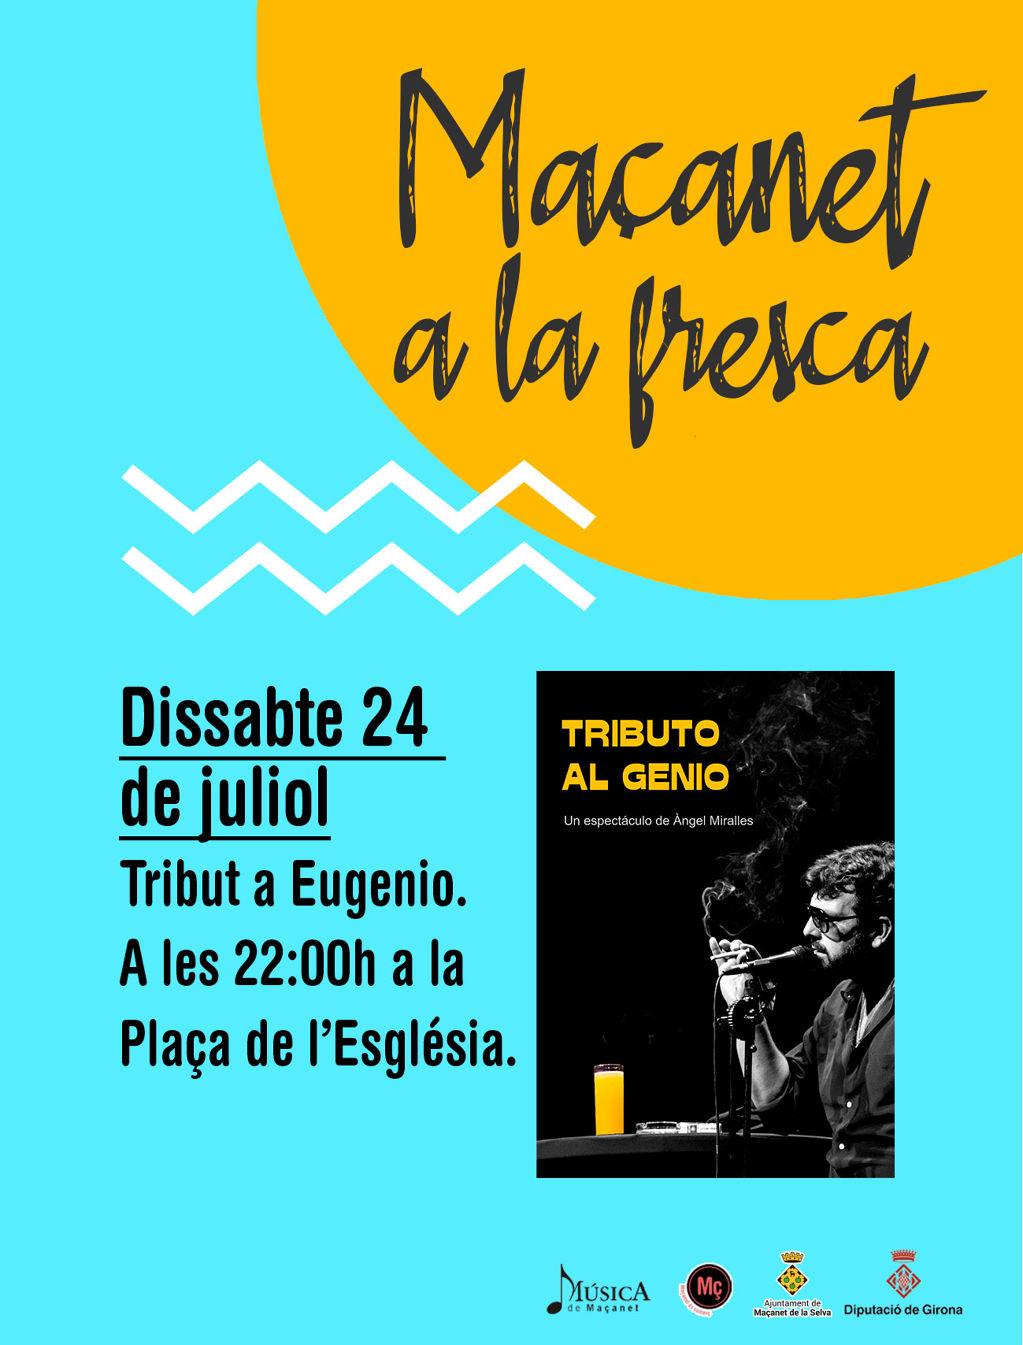 MAÇANET A LA FRESCA: Tribut a Eugenio - 19e9c-24-juliol.jpg